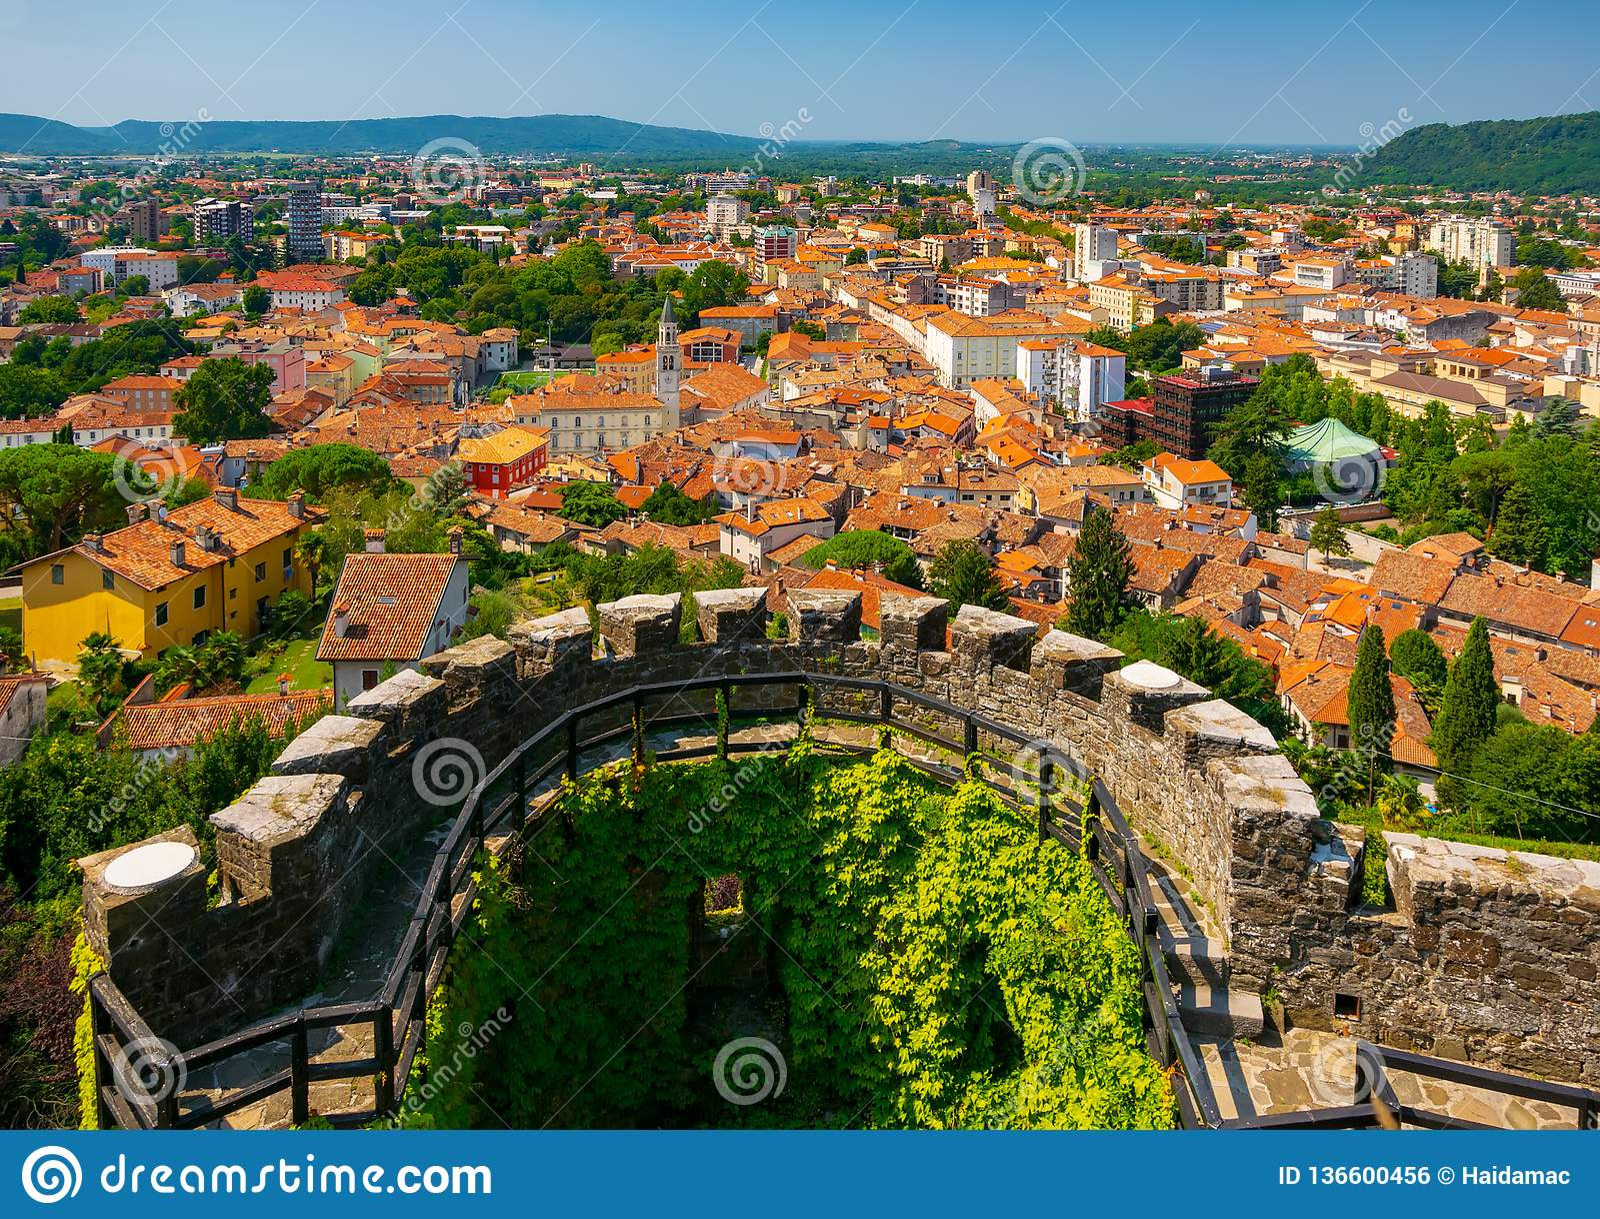 Vue aérienne de centre de la ville de Gorizia et de bastion semi-circulaire de château médiéval, Friuli Venezia Giulia, Italie